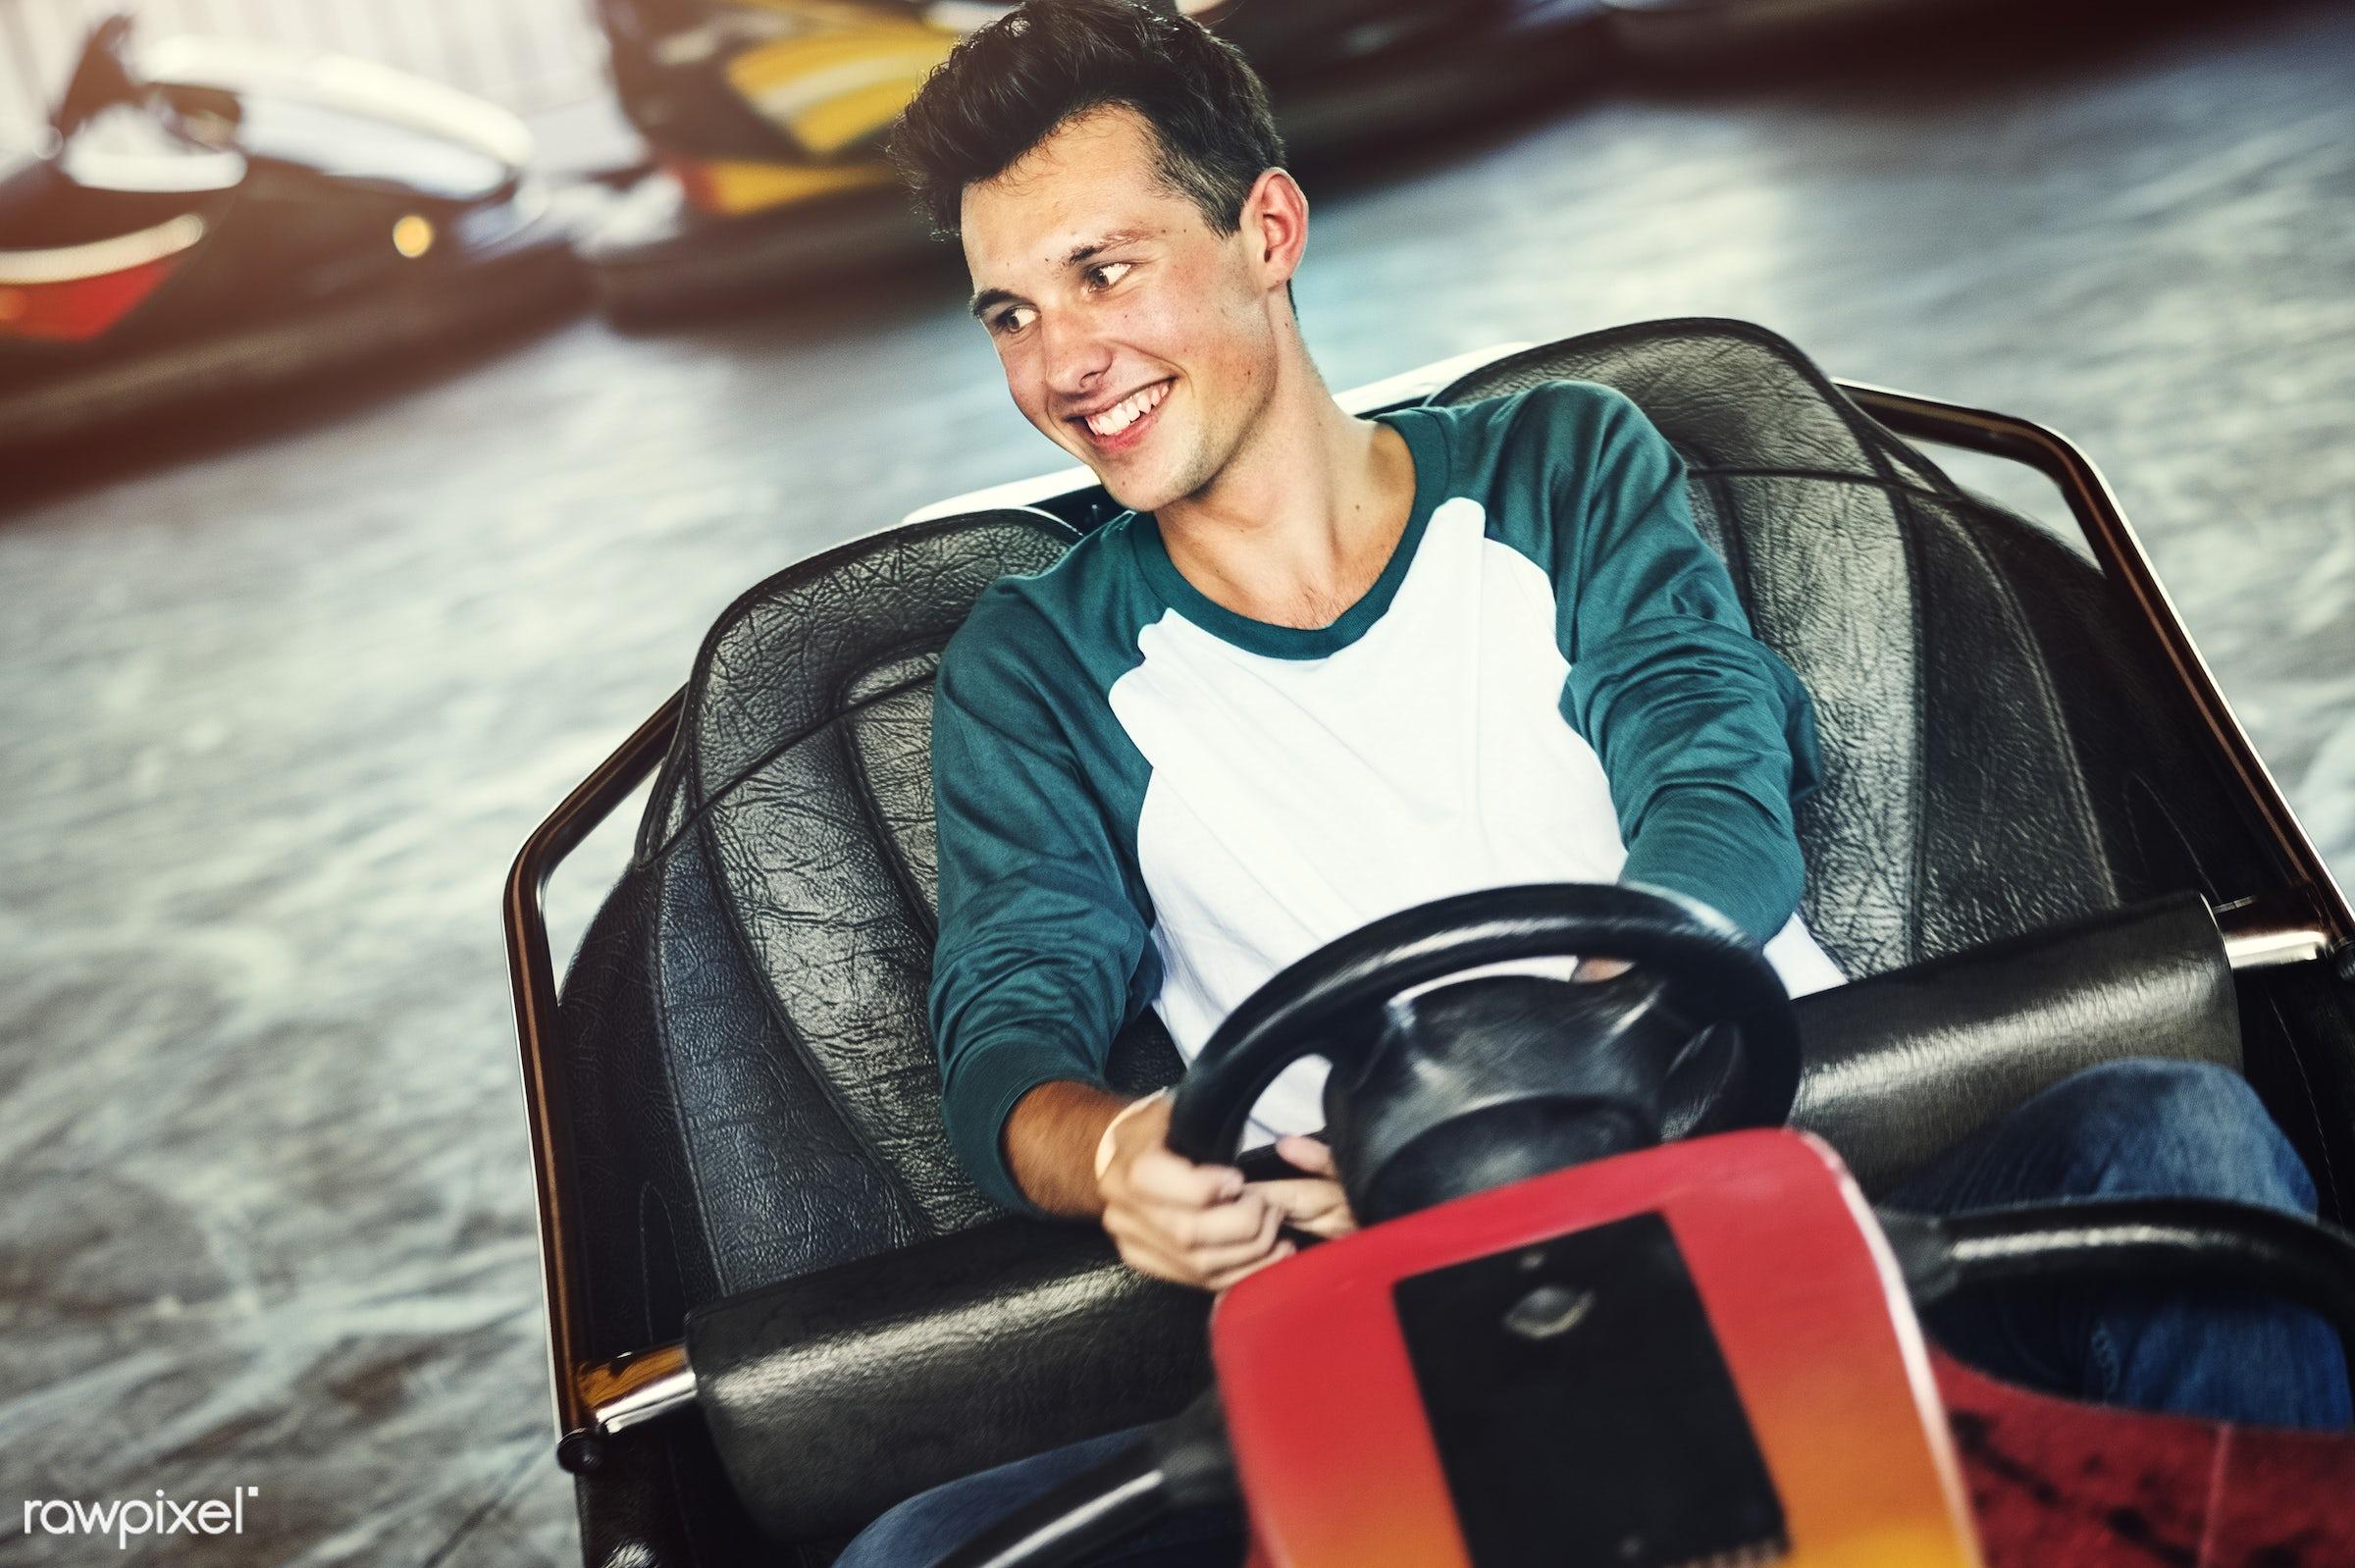 Young guy riding the bumper cars at an amusement park - adorable, affectionate, american, amusement park, beautiful,...